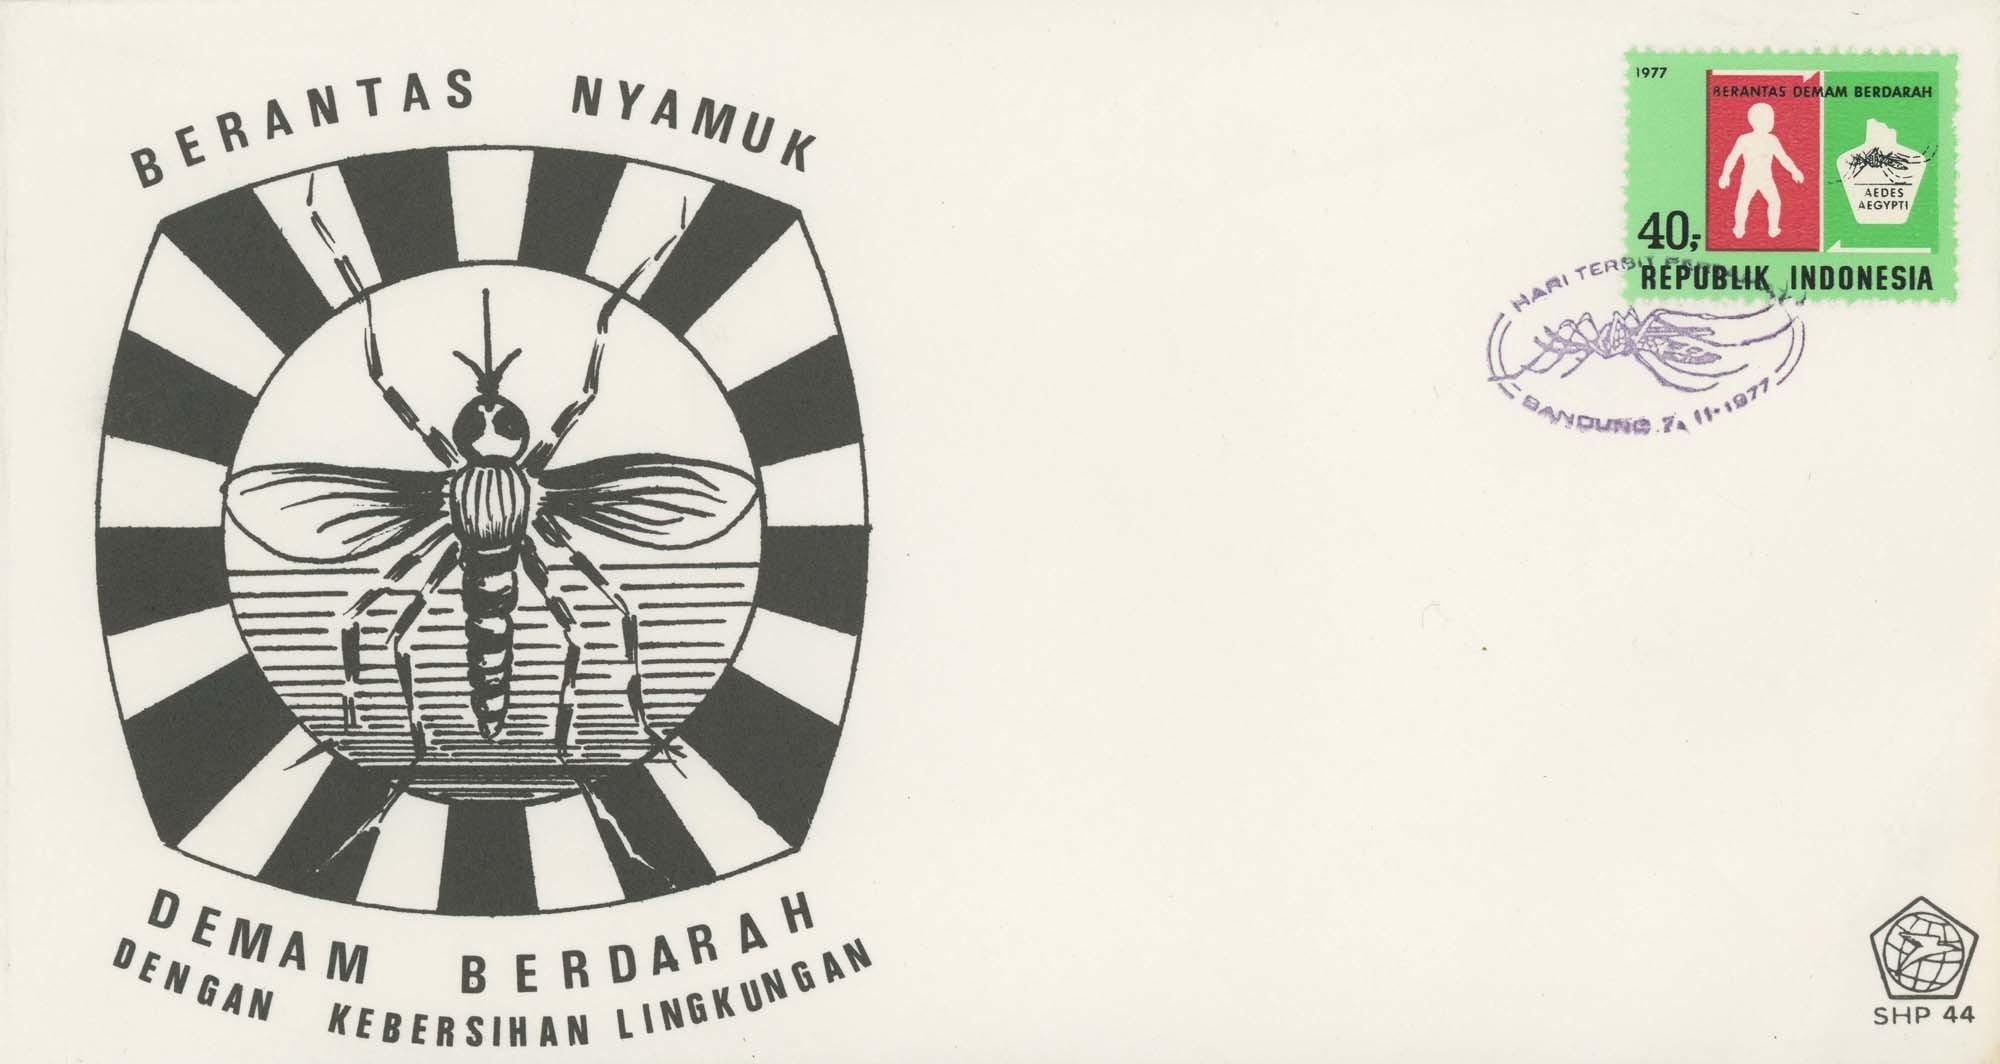 Bandung:7-11-1977